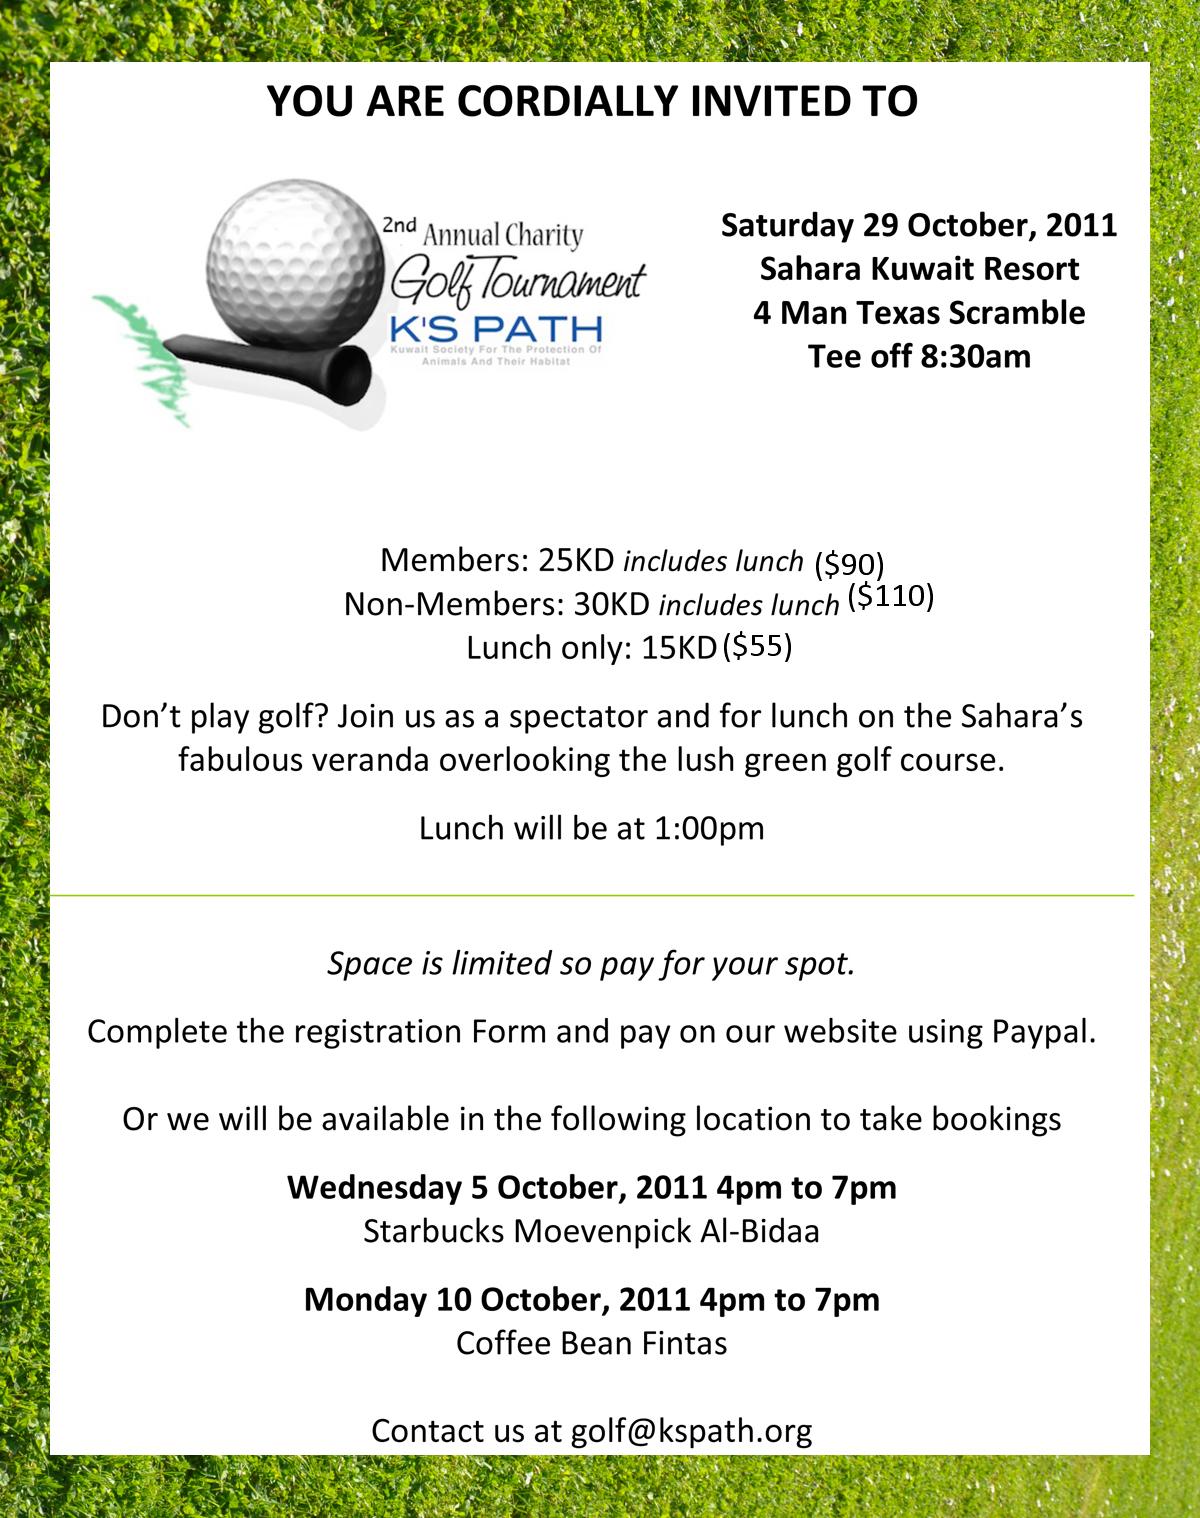 Golf tournament invitations templates hatchurbanskript golf tournament invitations templates stopboris Images